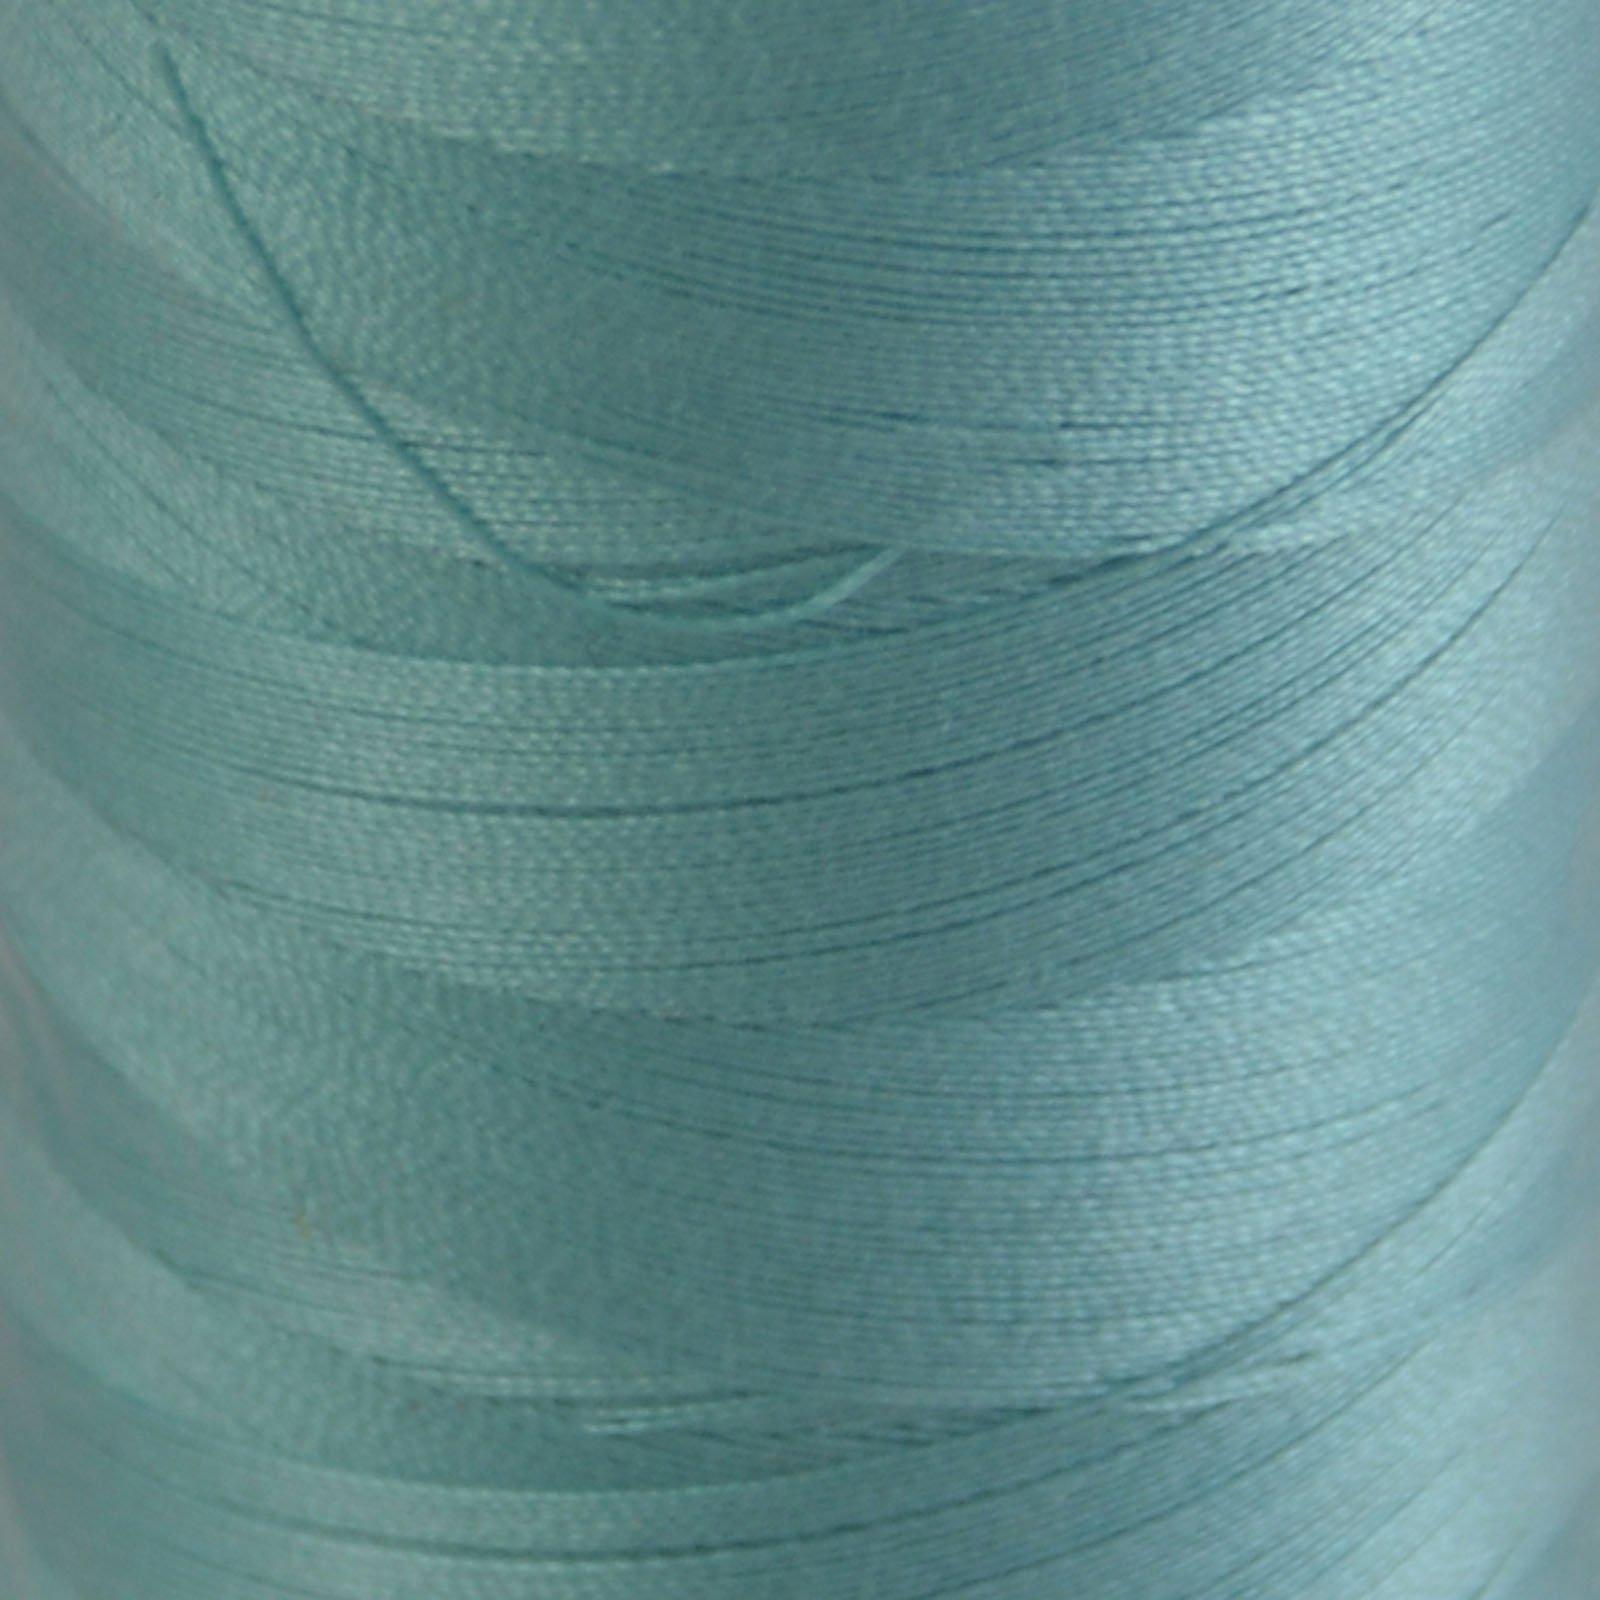 # 5006 Light Turquoise